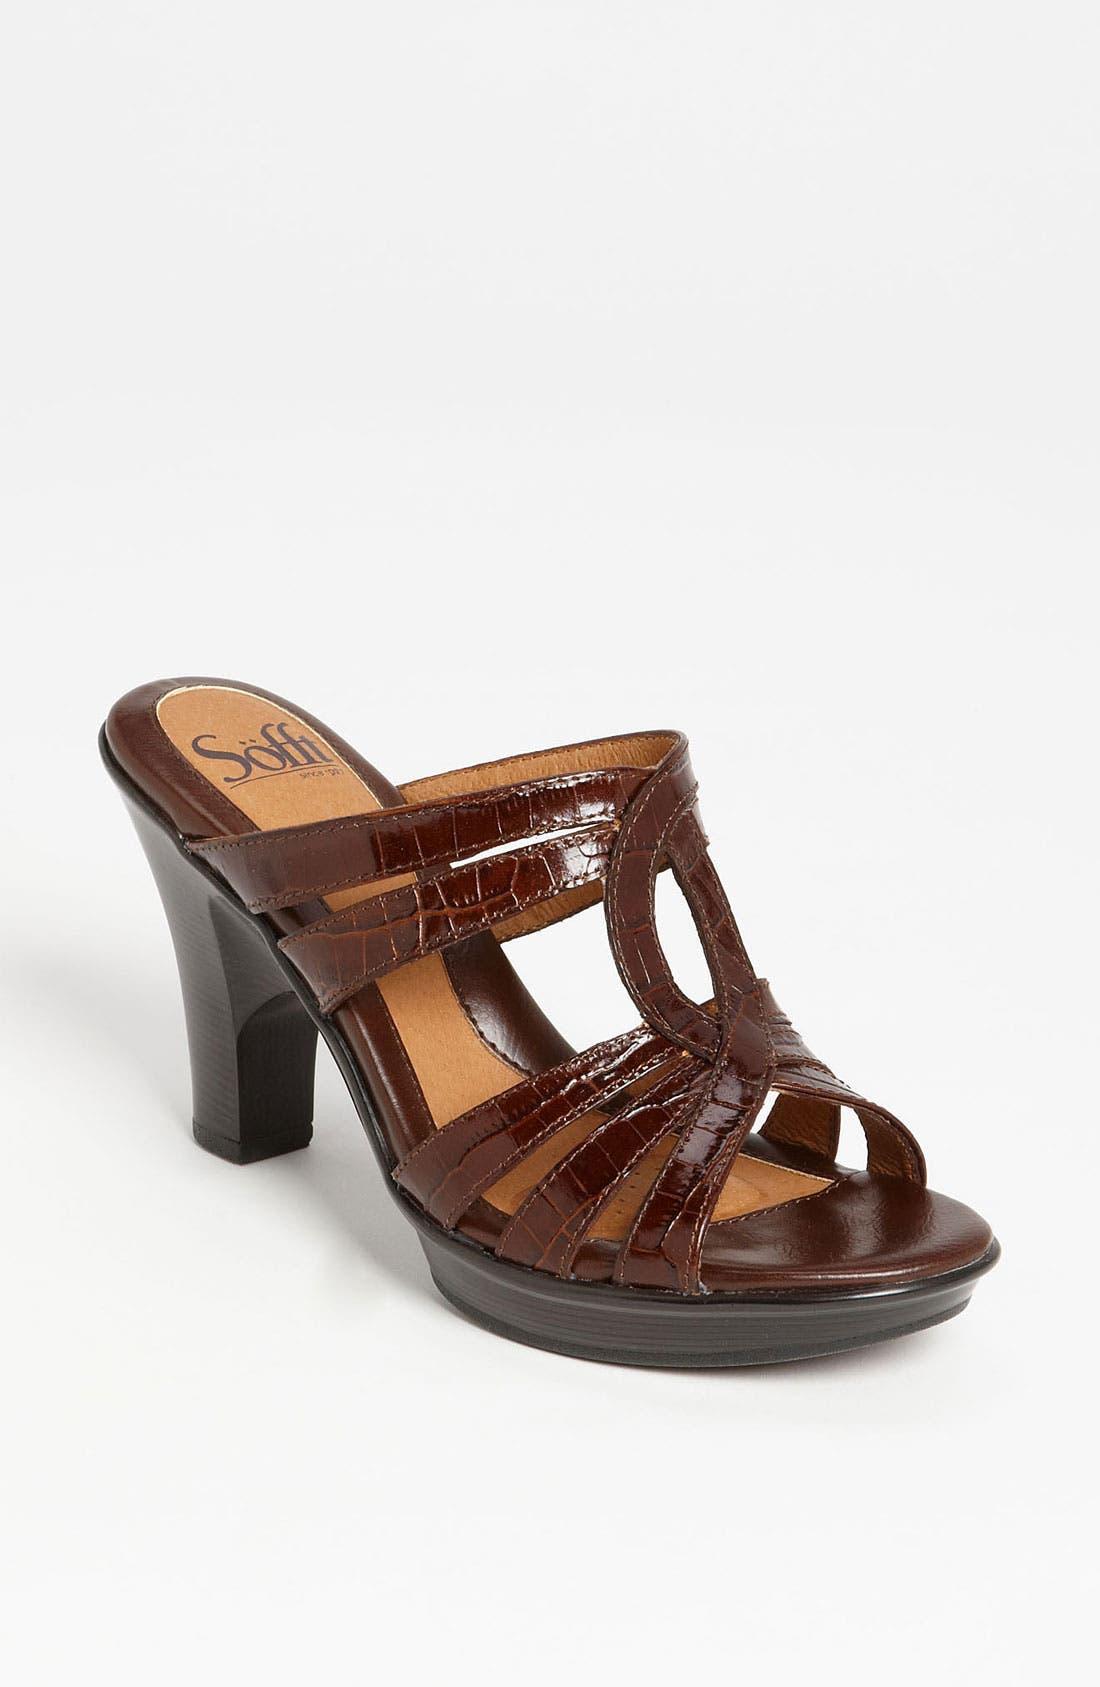 Main Image - Söfft 'Pascale' Sandal